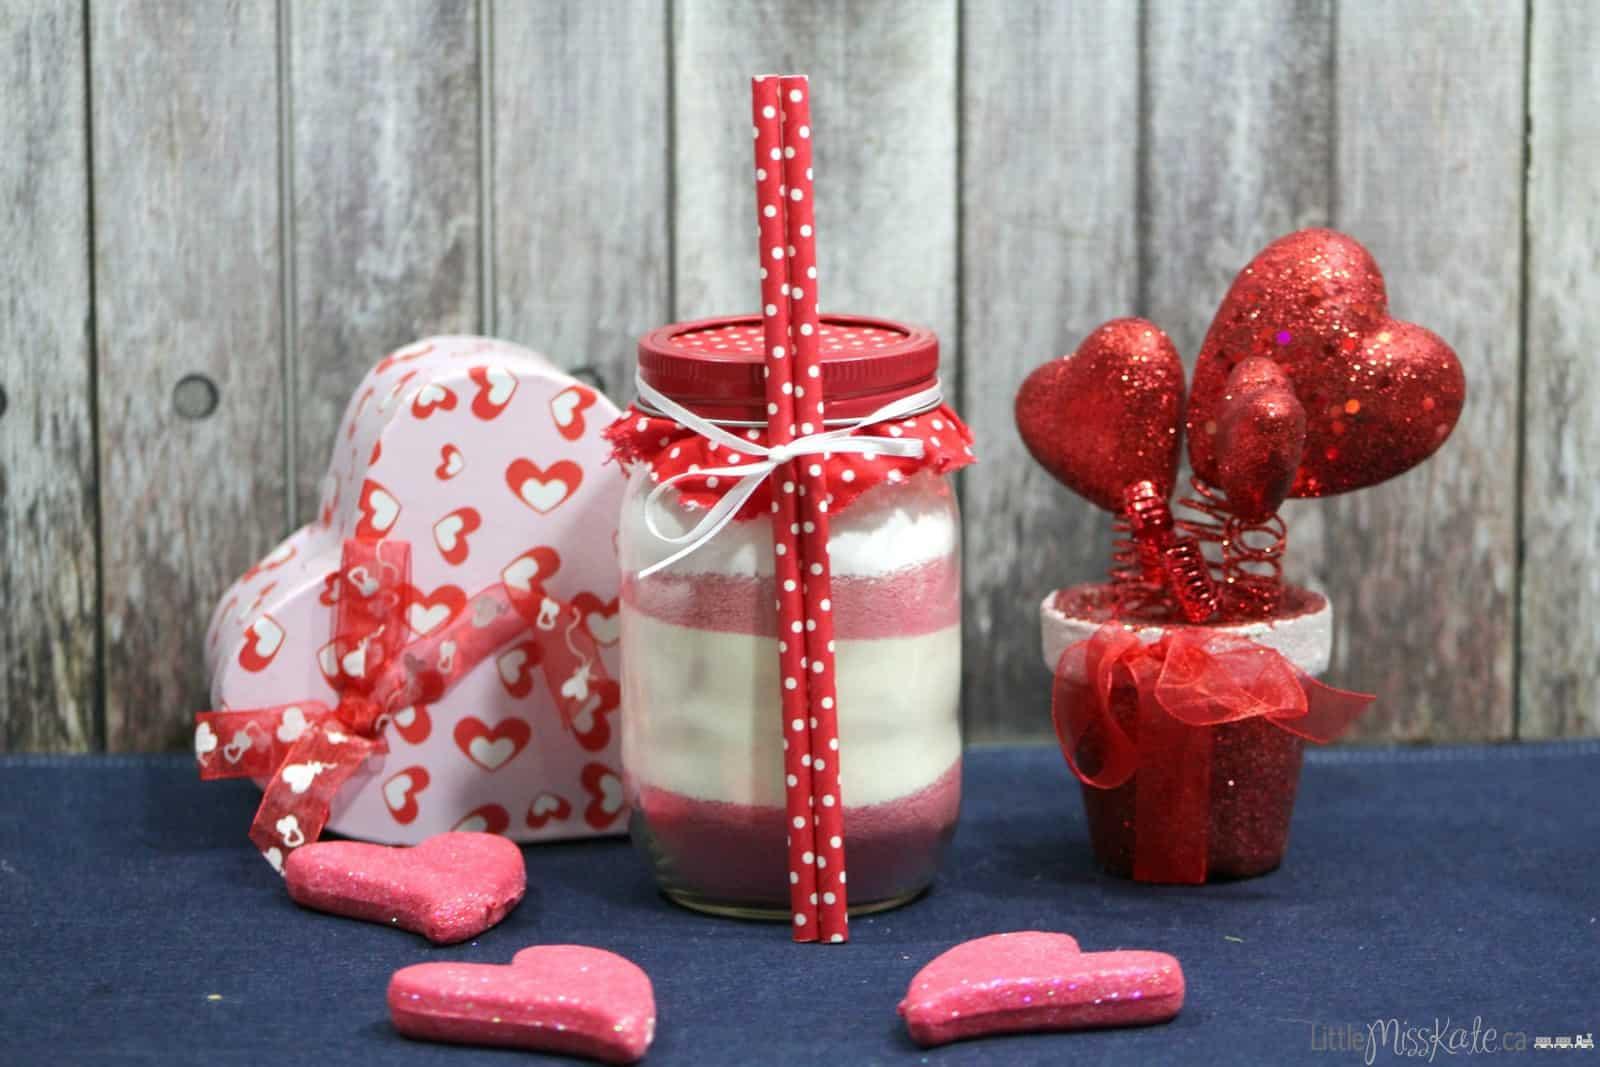 mason-jar-gift-idea-hot-Strawberry-drink-mix-recipe-valentines-day-drink-idea-02